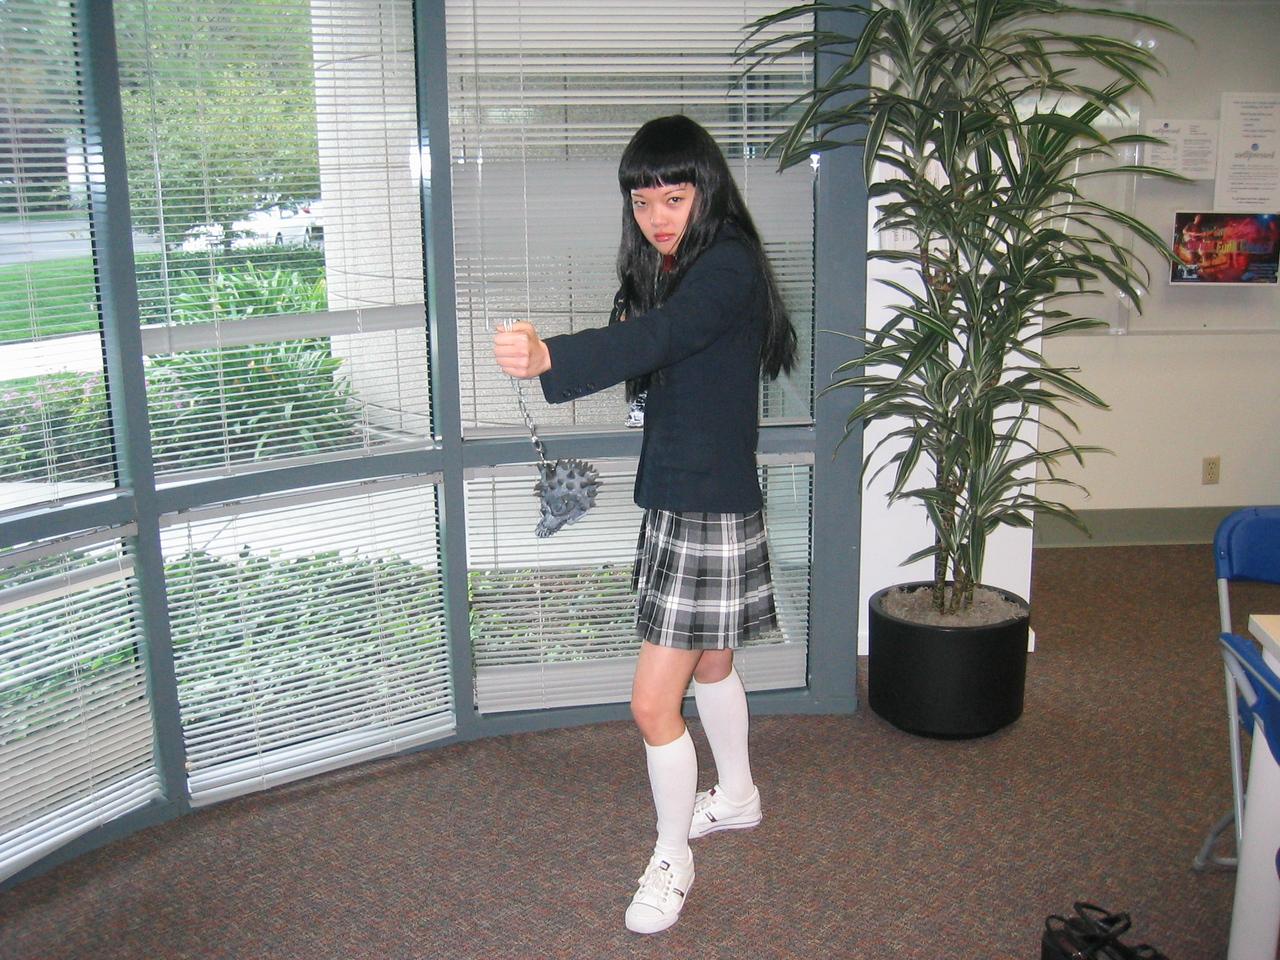 2004 10 29 Friday - Joann Chu as the Kill Bill girl 1